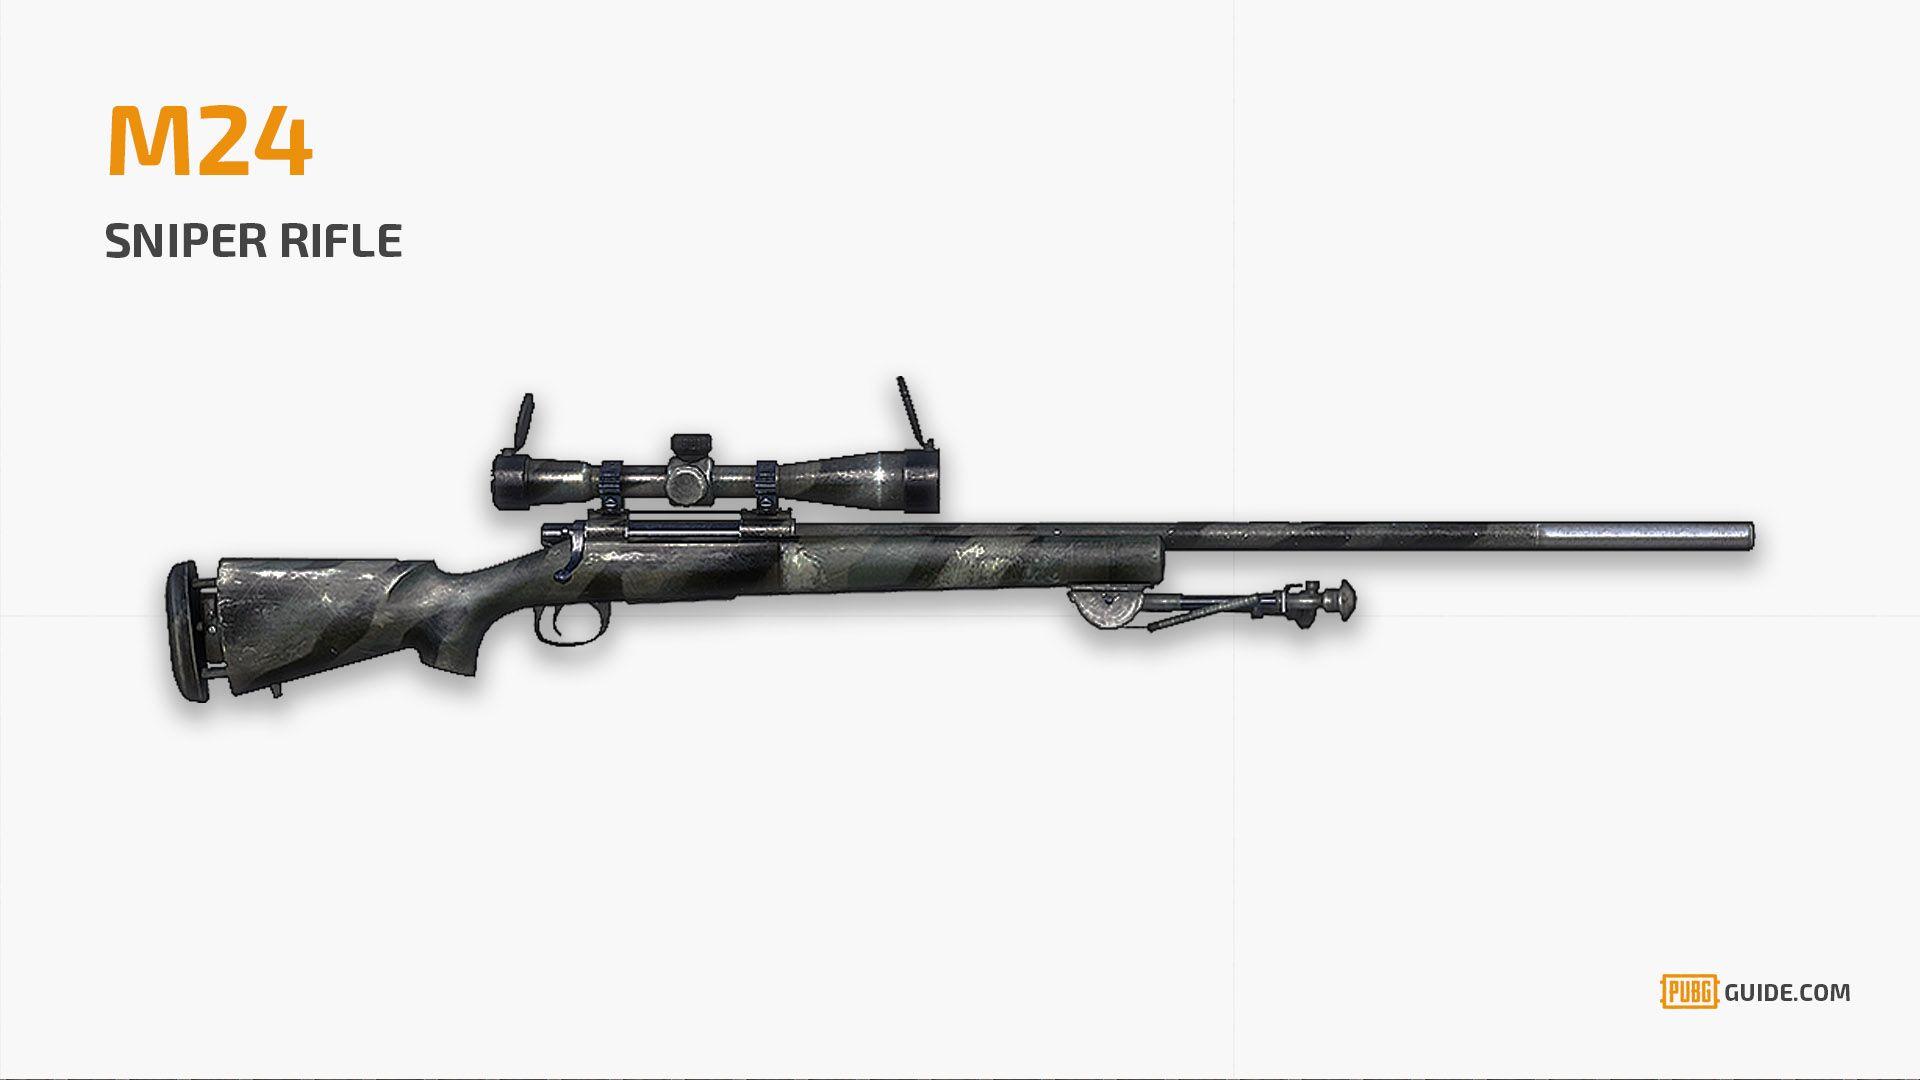 pubg m24 ، pubg wallpaper 4k ، free pubg تحميل ، pubg sniper